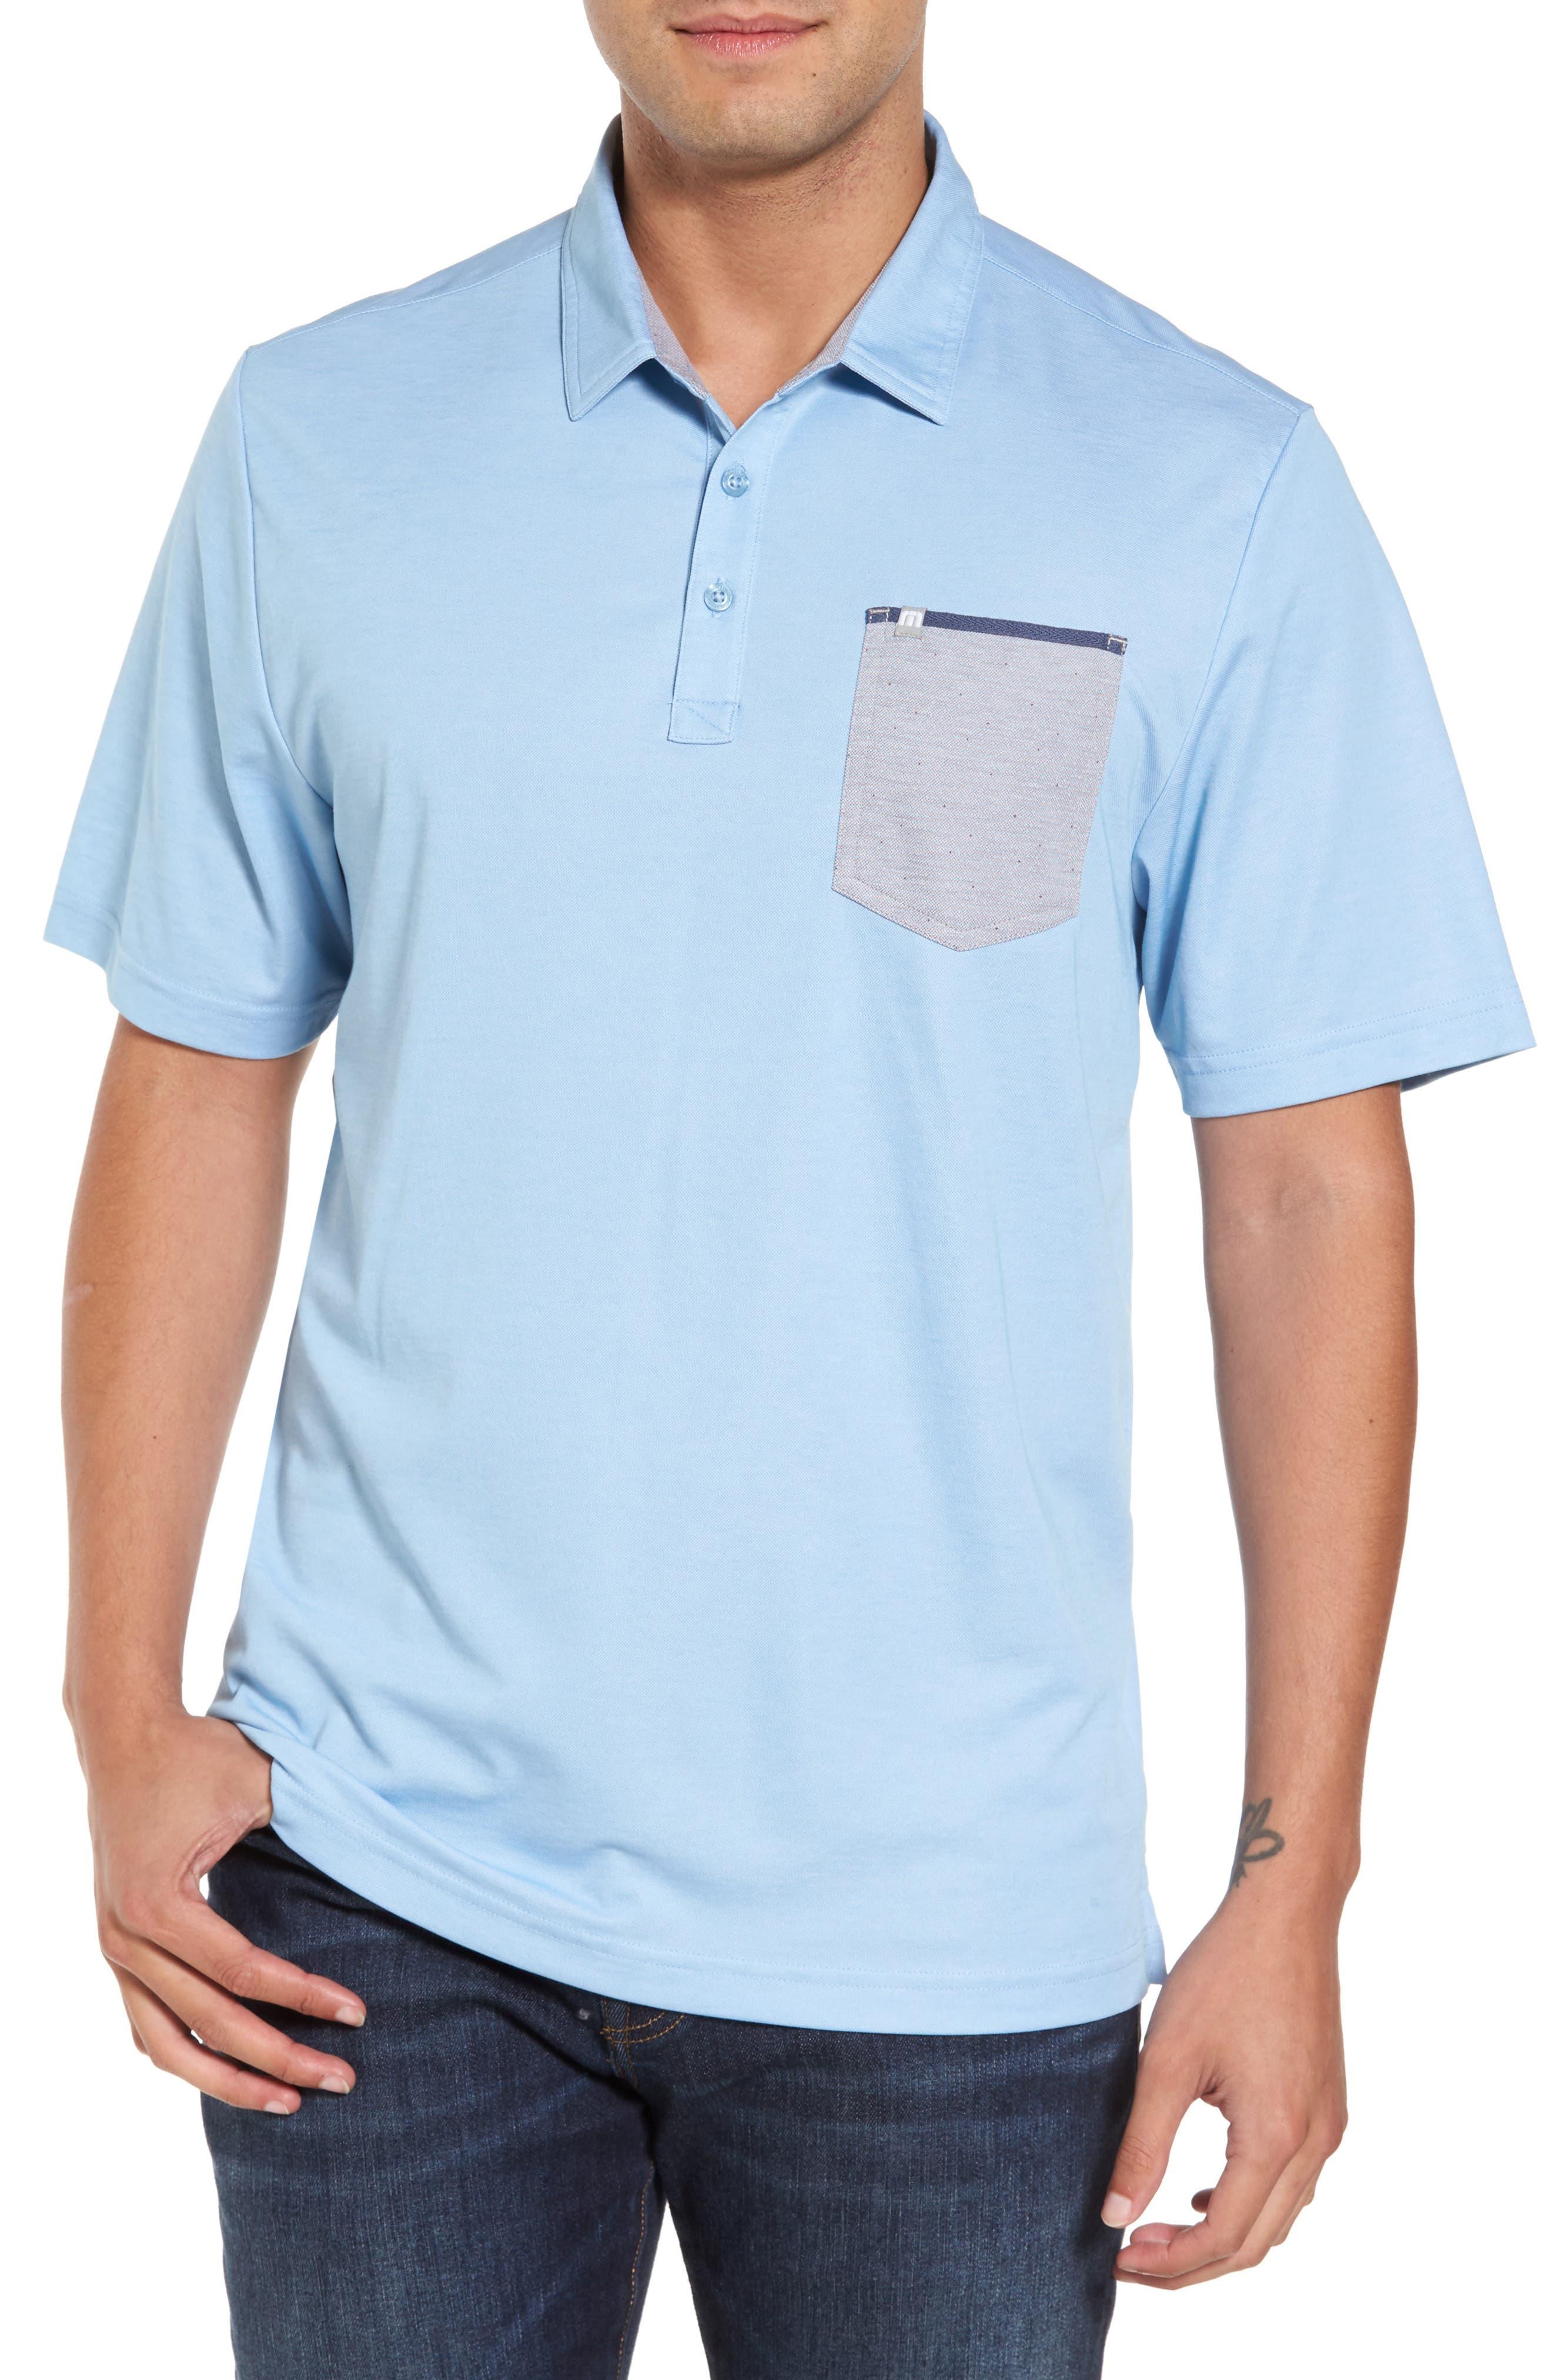 Freeburg Pocket Polo,                         Main,                         color, Heather Dusk Blue